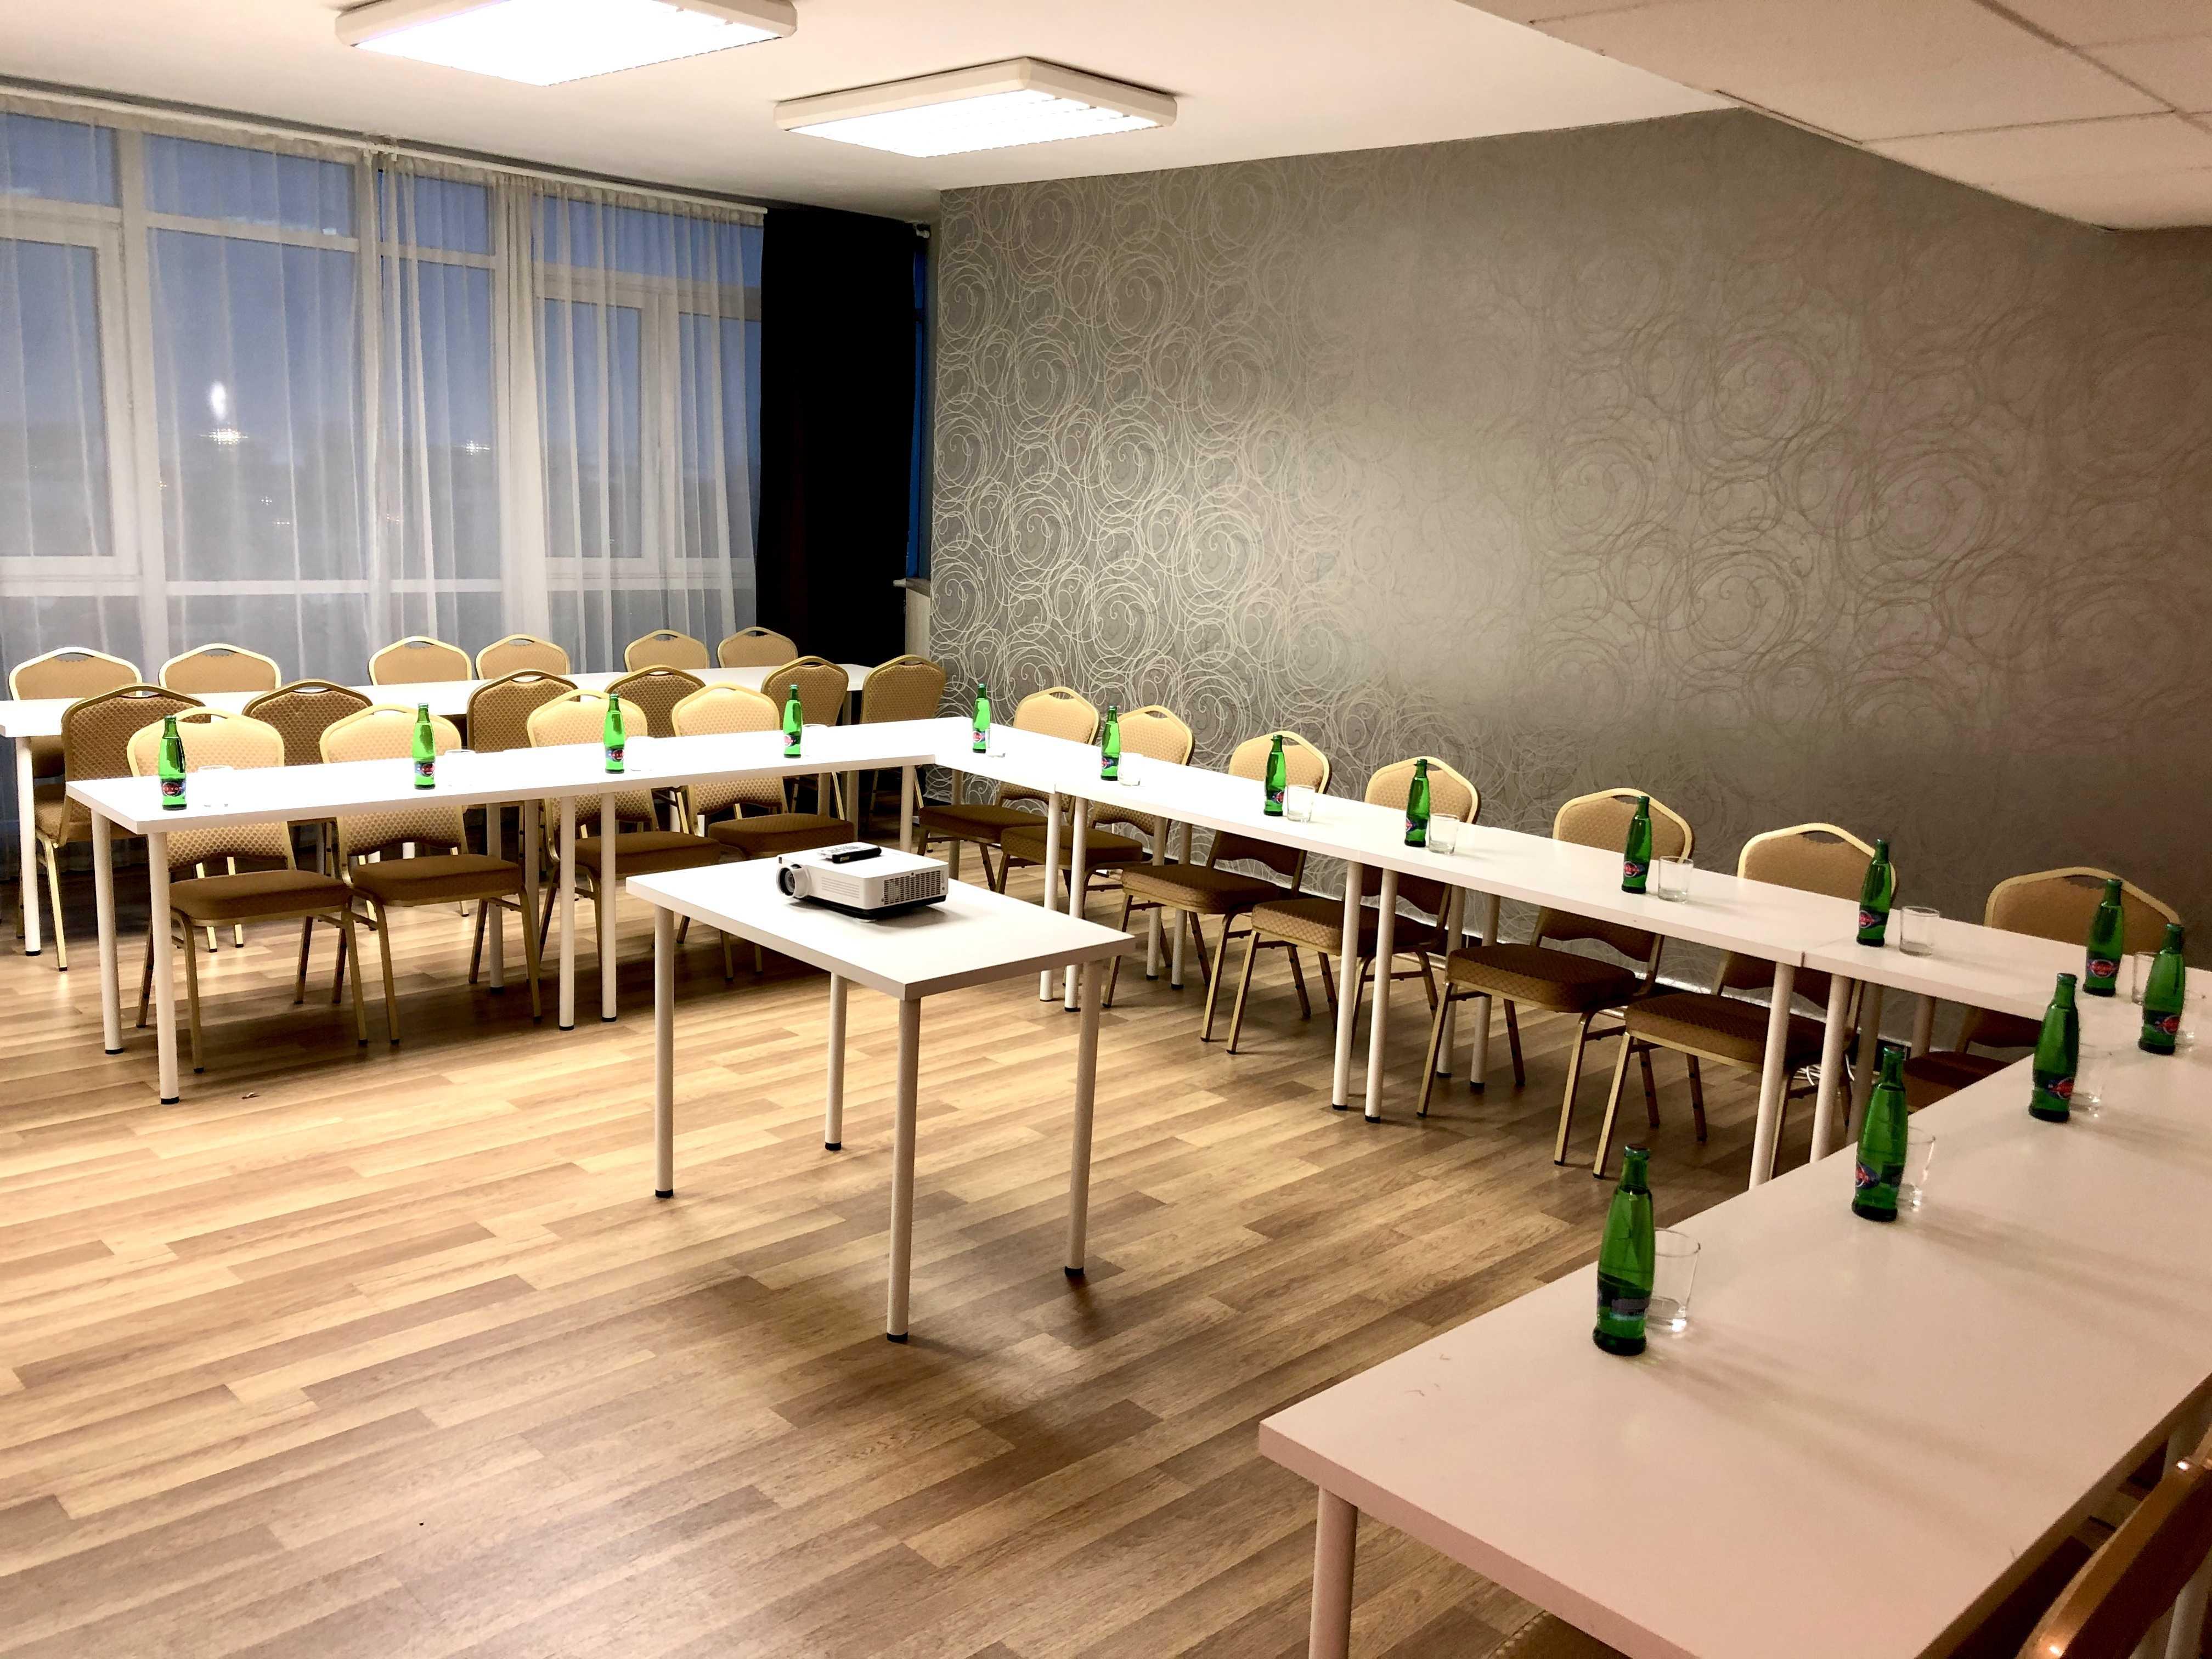 hotel-modena_skolici-mistnost-1